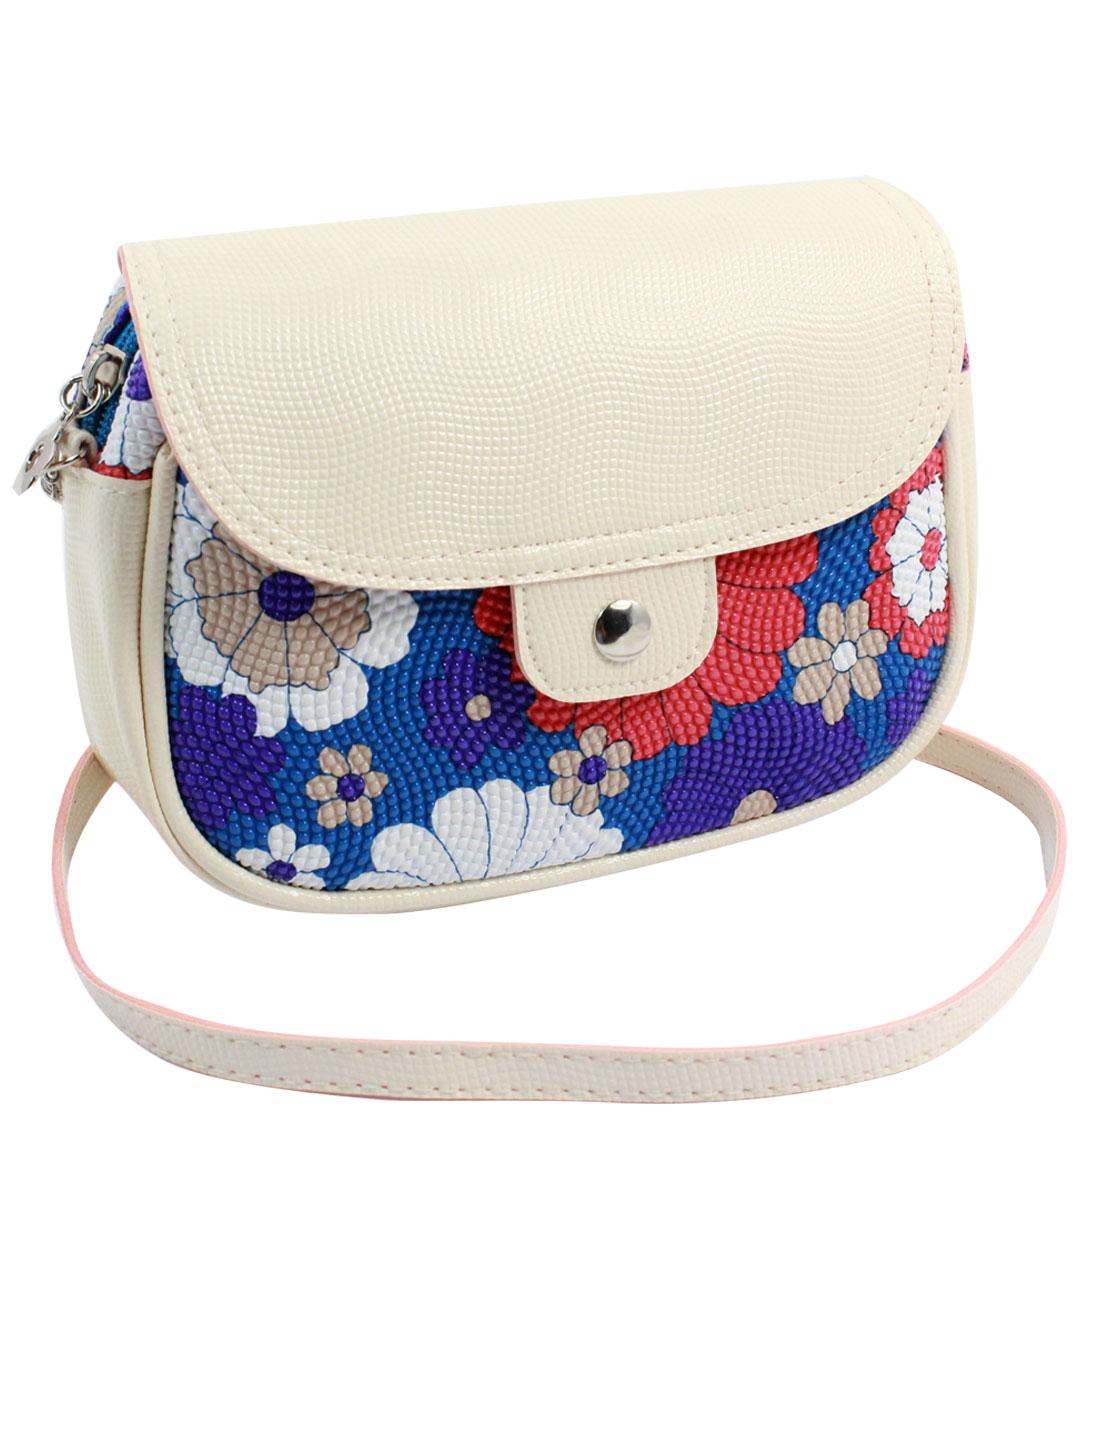 Women 2 Pockets Magnet Button Zipper Closure Floral Print Faux Leather Wallet Purse Bag Blue White Red w Strap